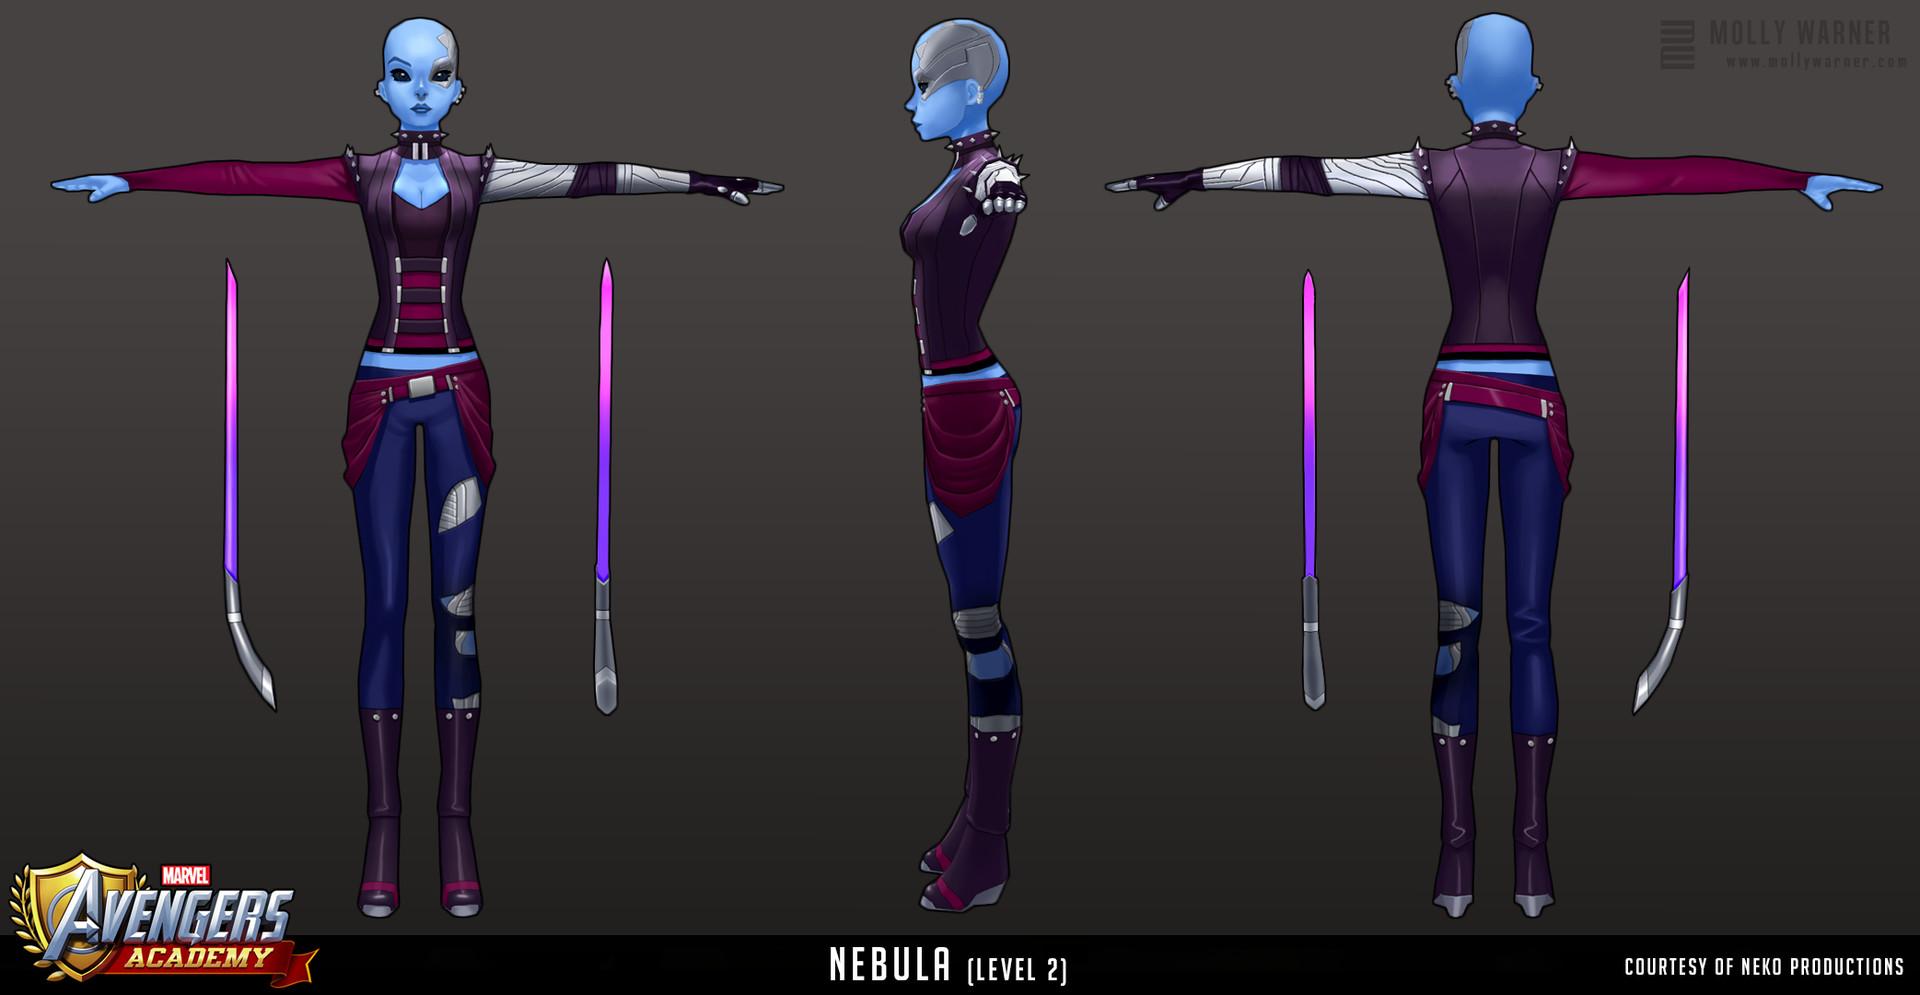 Molly warner 16 avengers academy nebula l2